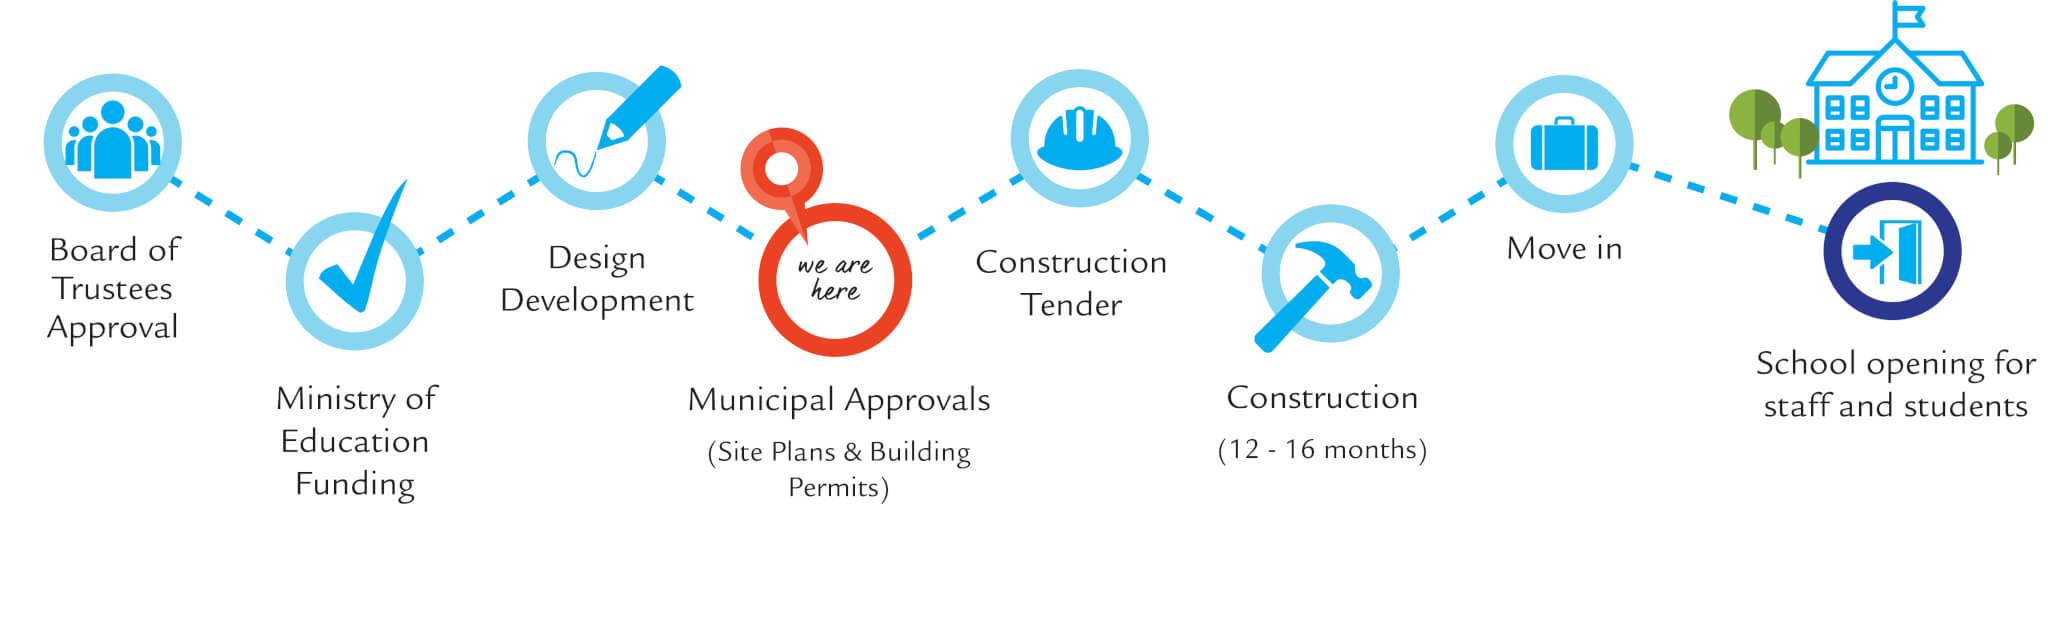 Municipal Approvals